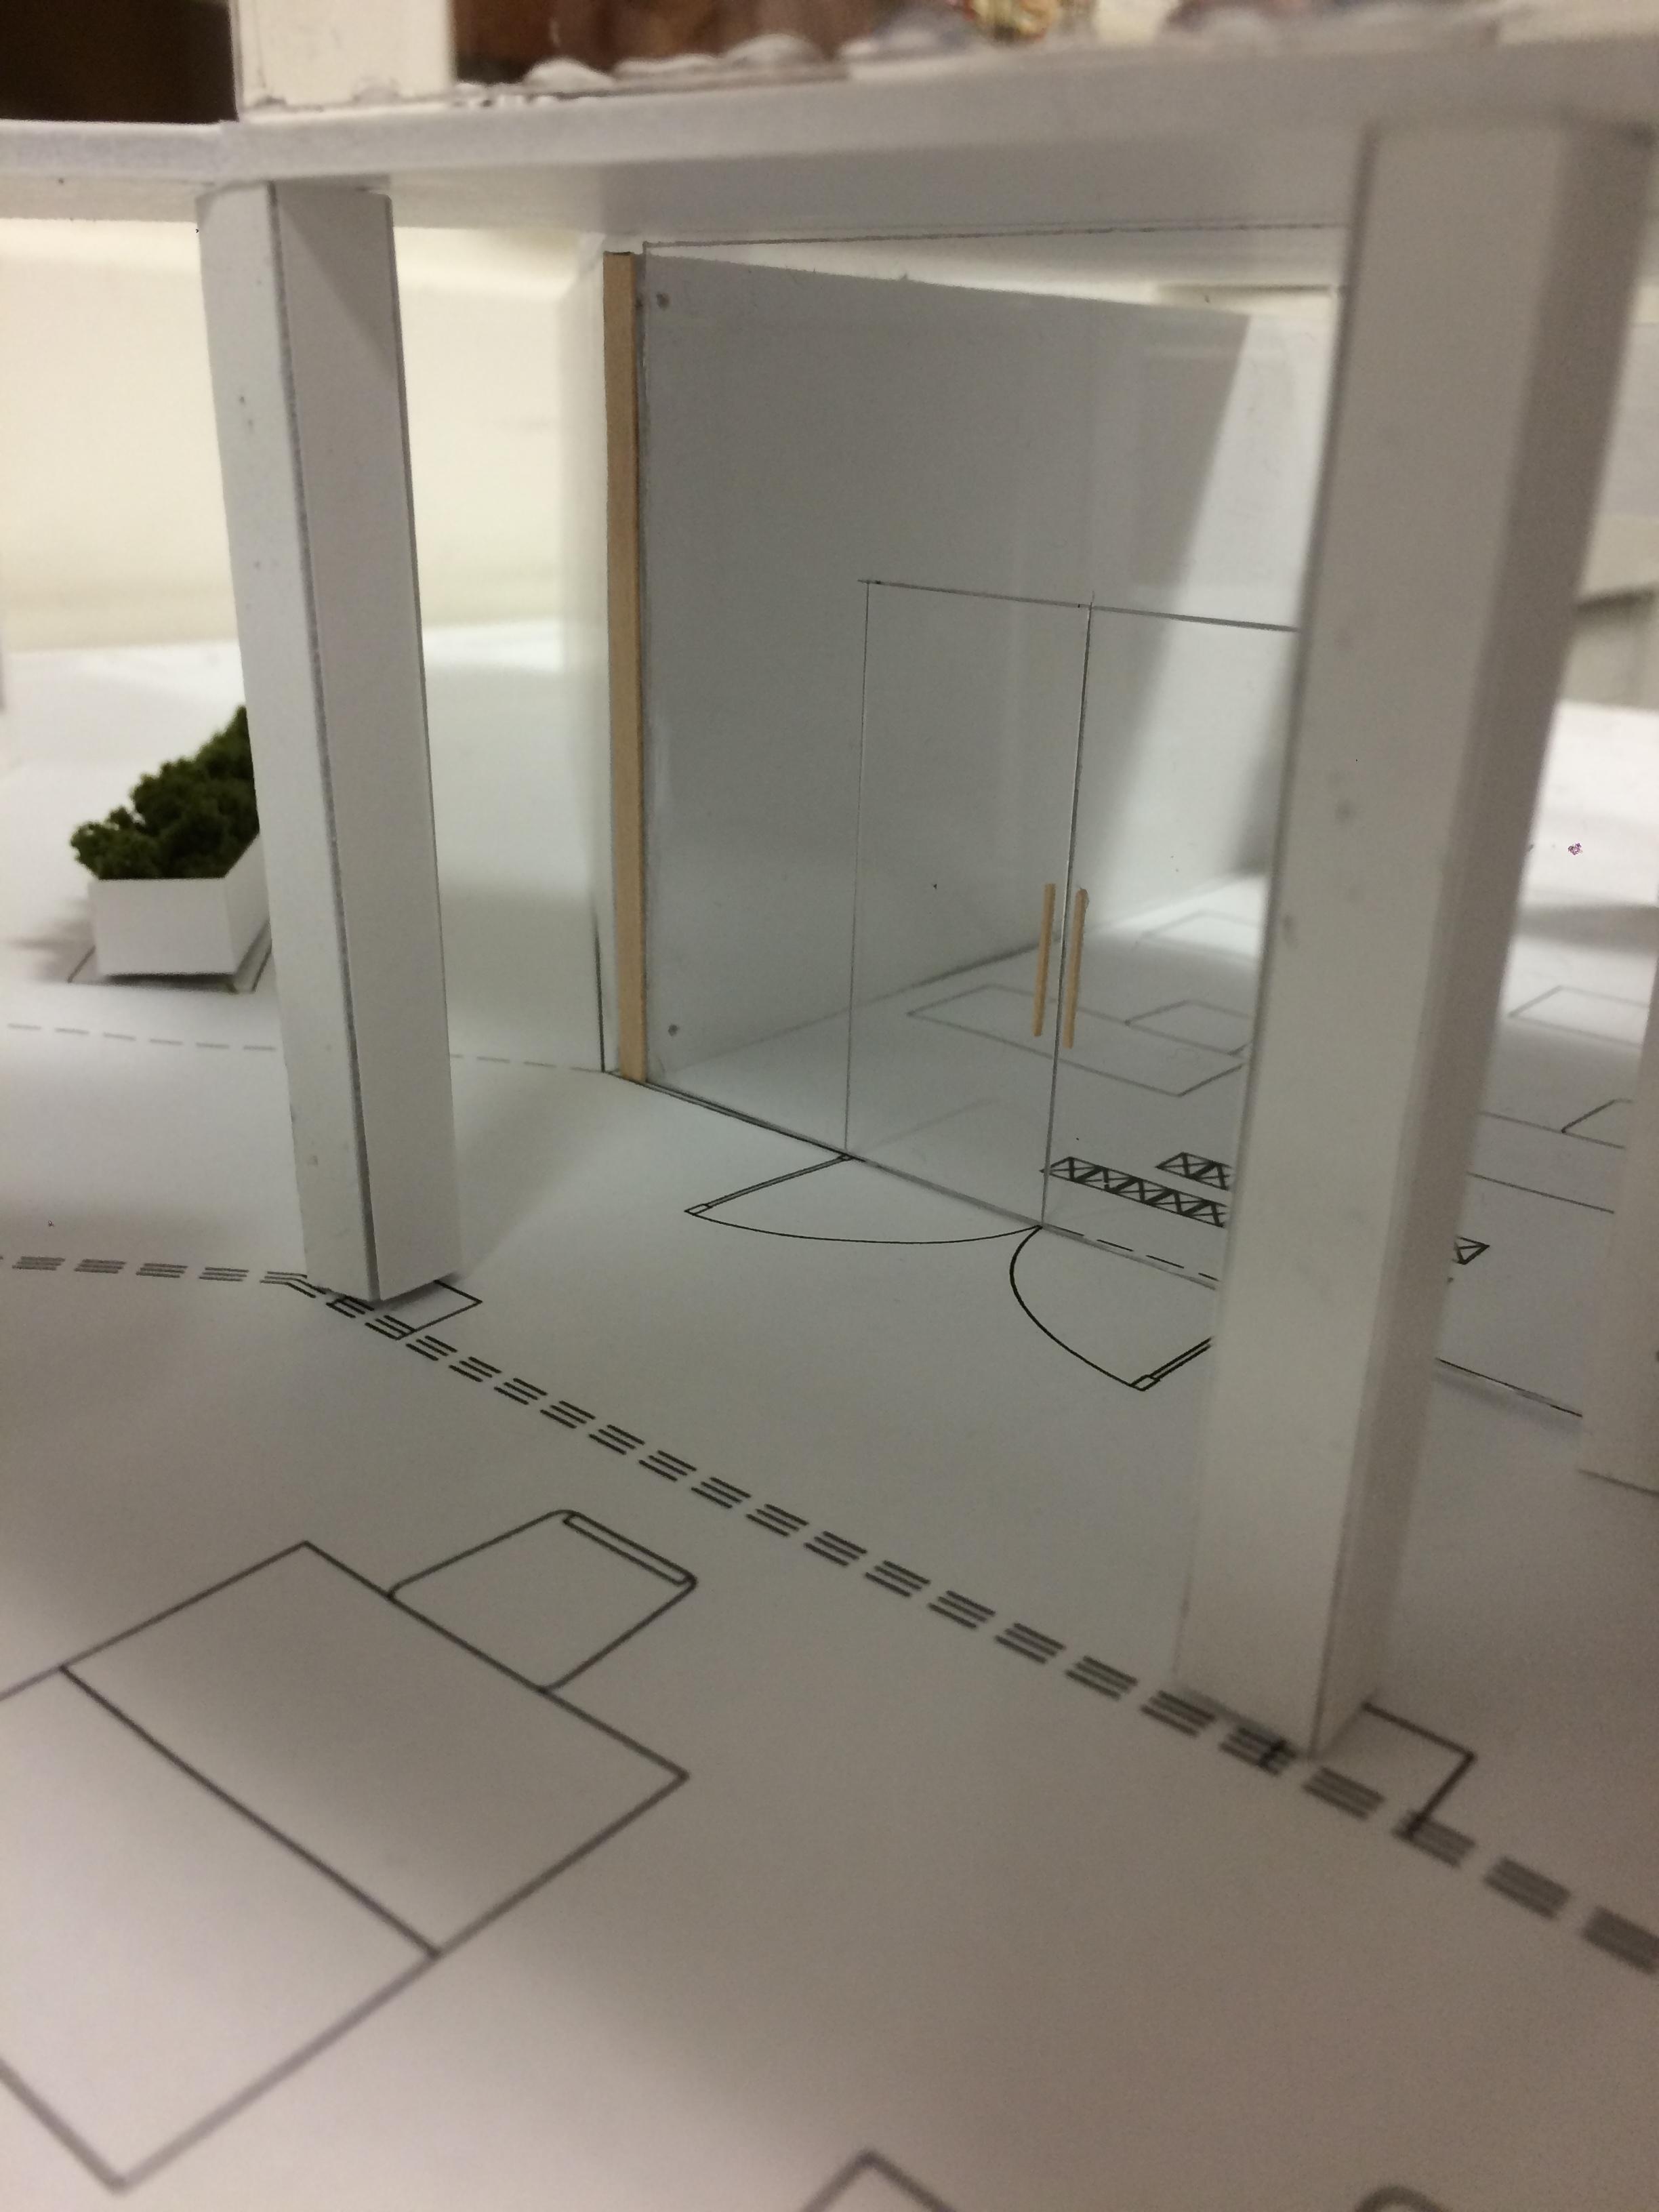 IT and hallway